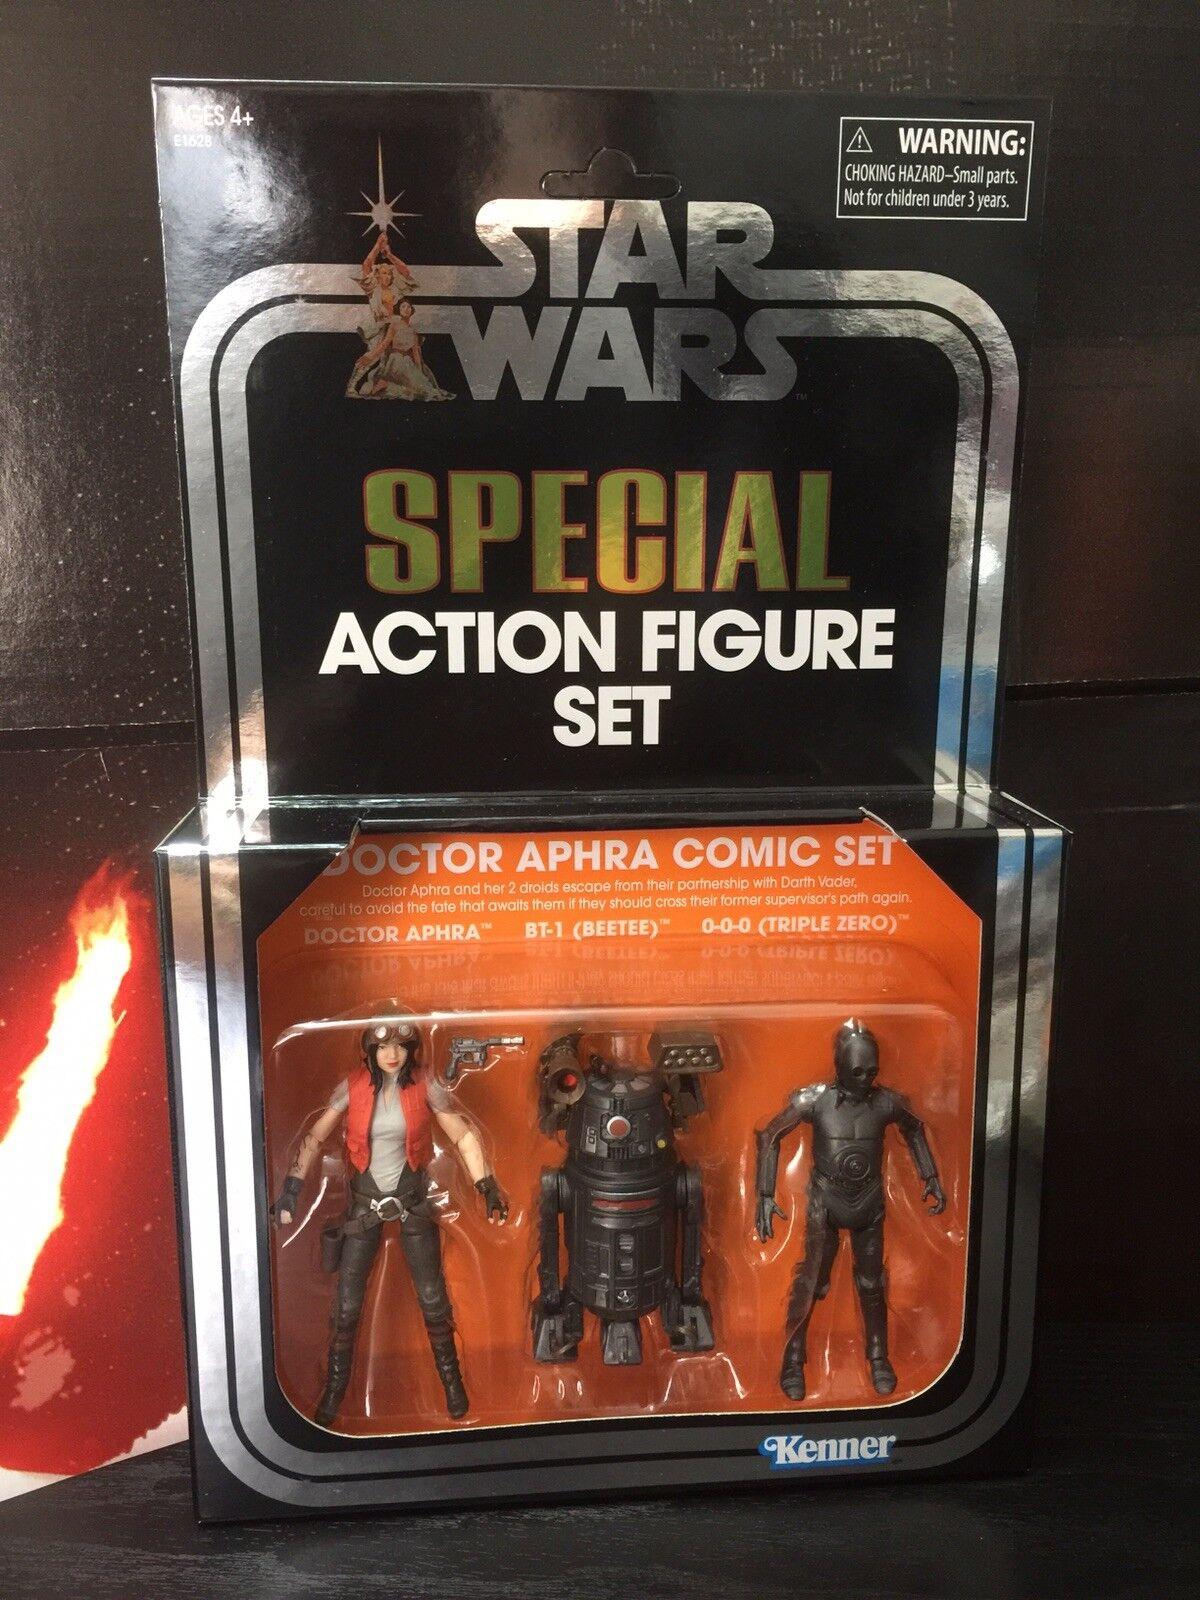 Star - wars - vintage - kollektion sdcc exklusive 2018 - arzt aphra comic figure set